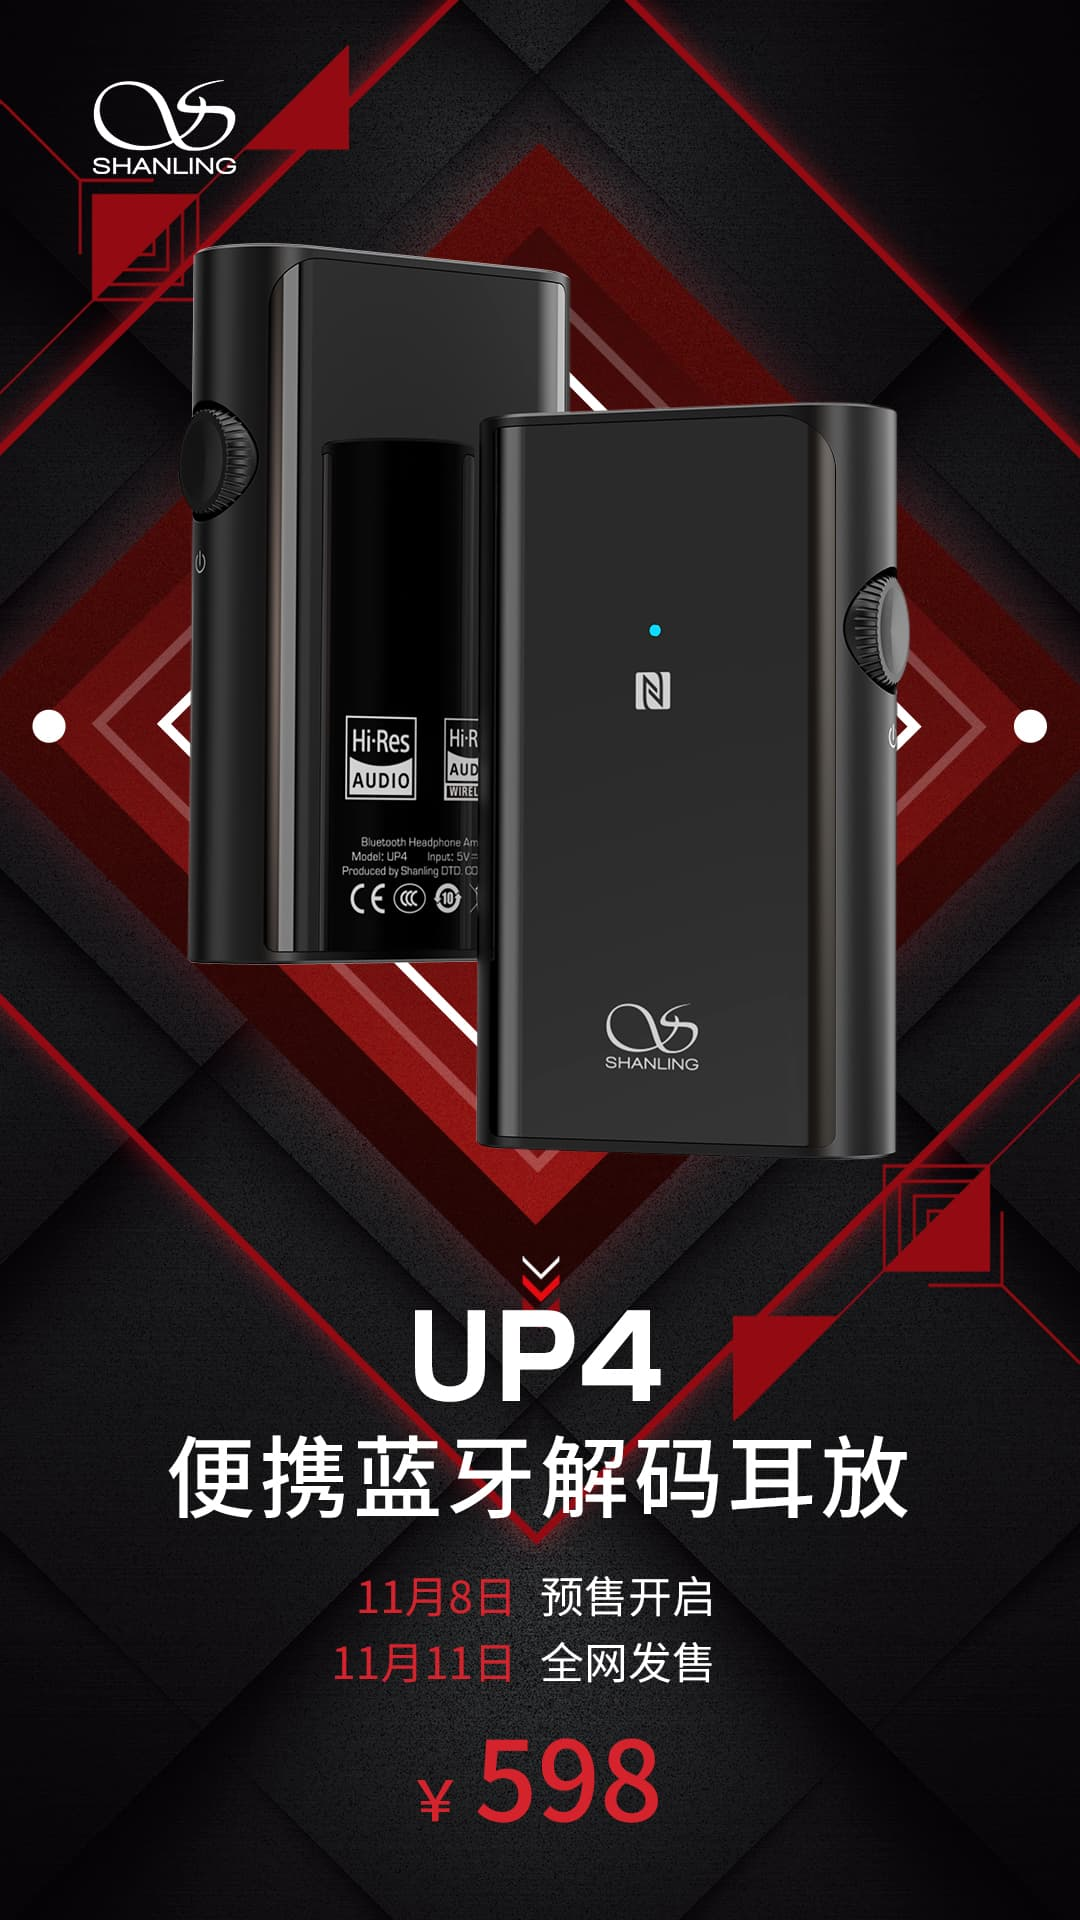 UP4 预售 全网发售 公告【压缩】.jpg